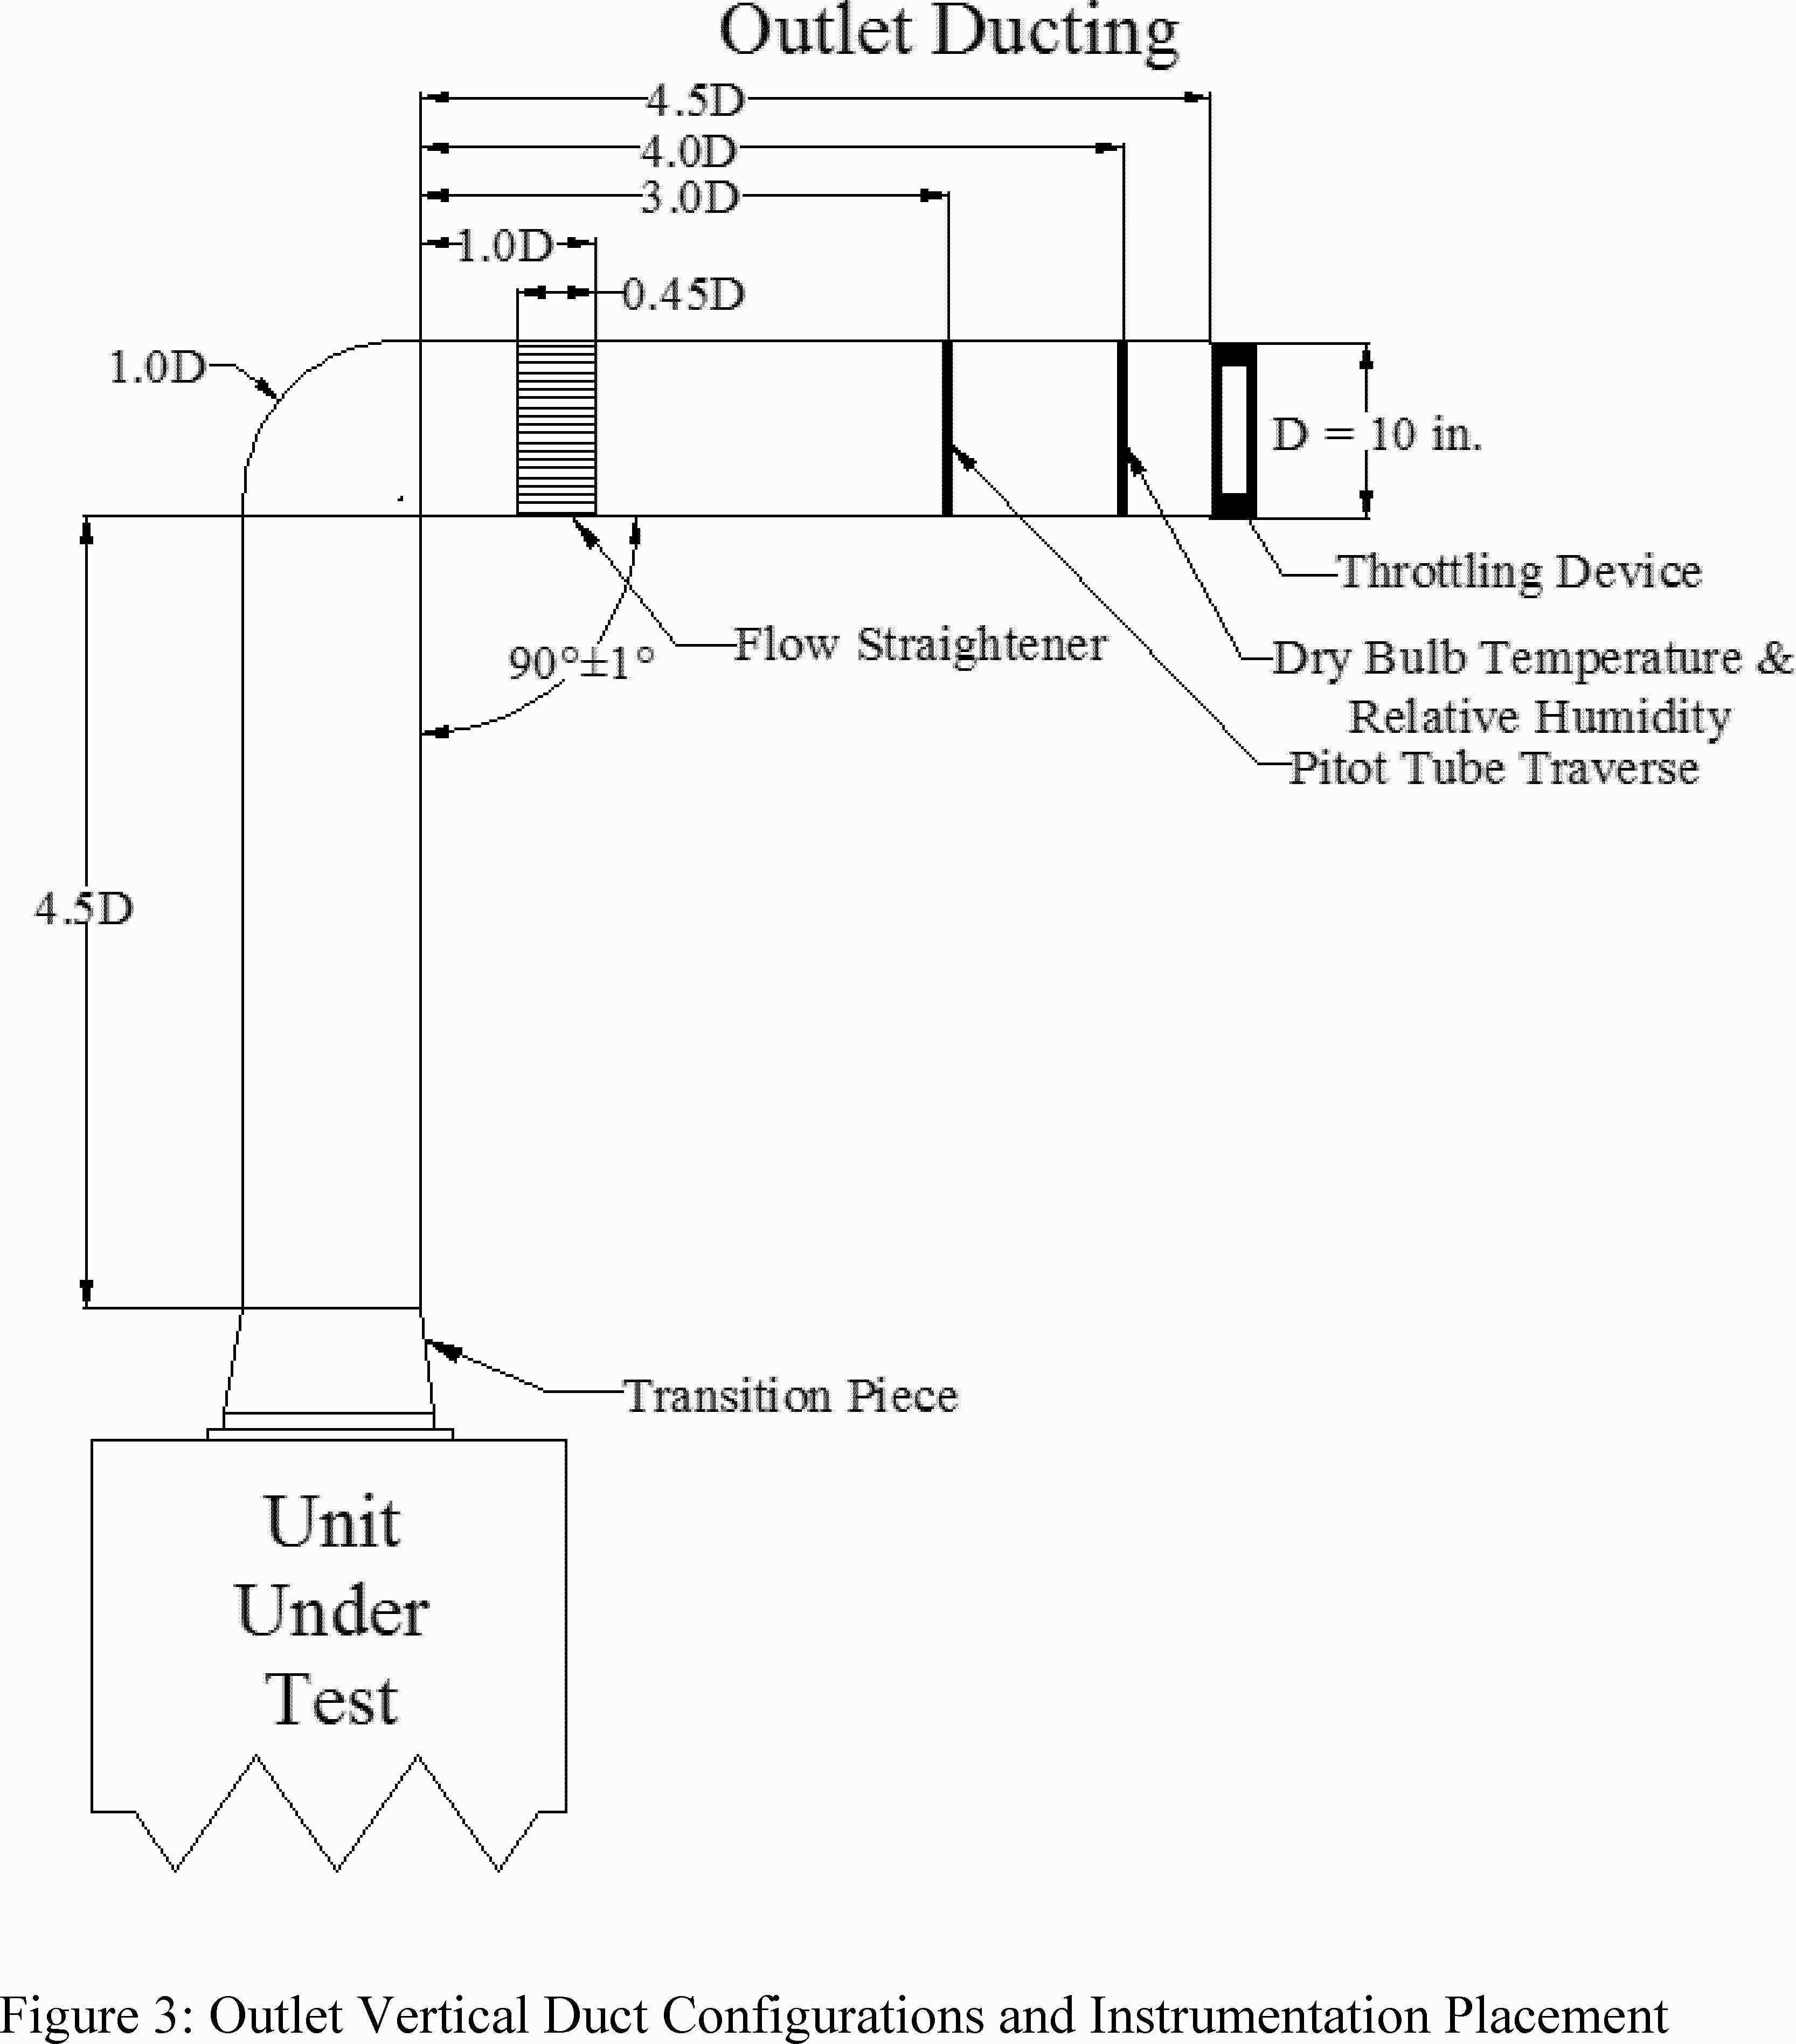 Free Car Wiring Diagrams 38v Wiring Diagram Wiring Diagrams Of Free Car Wiring Diagrams